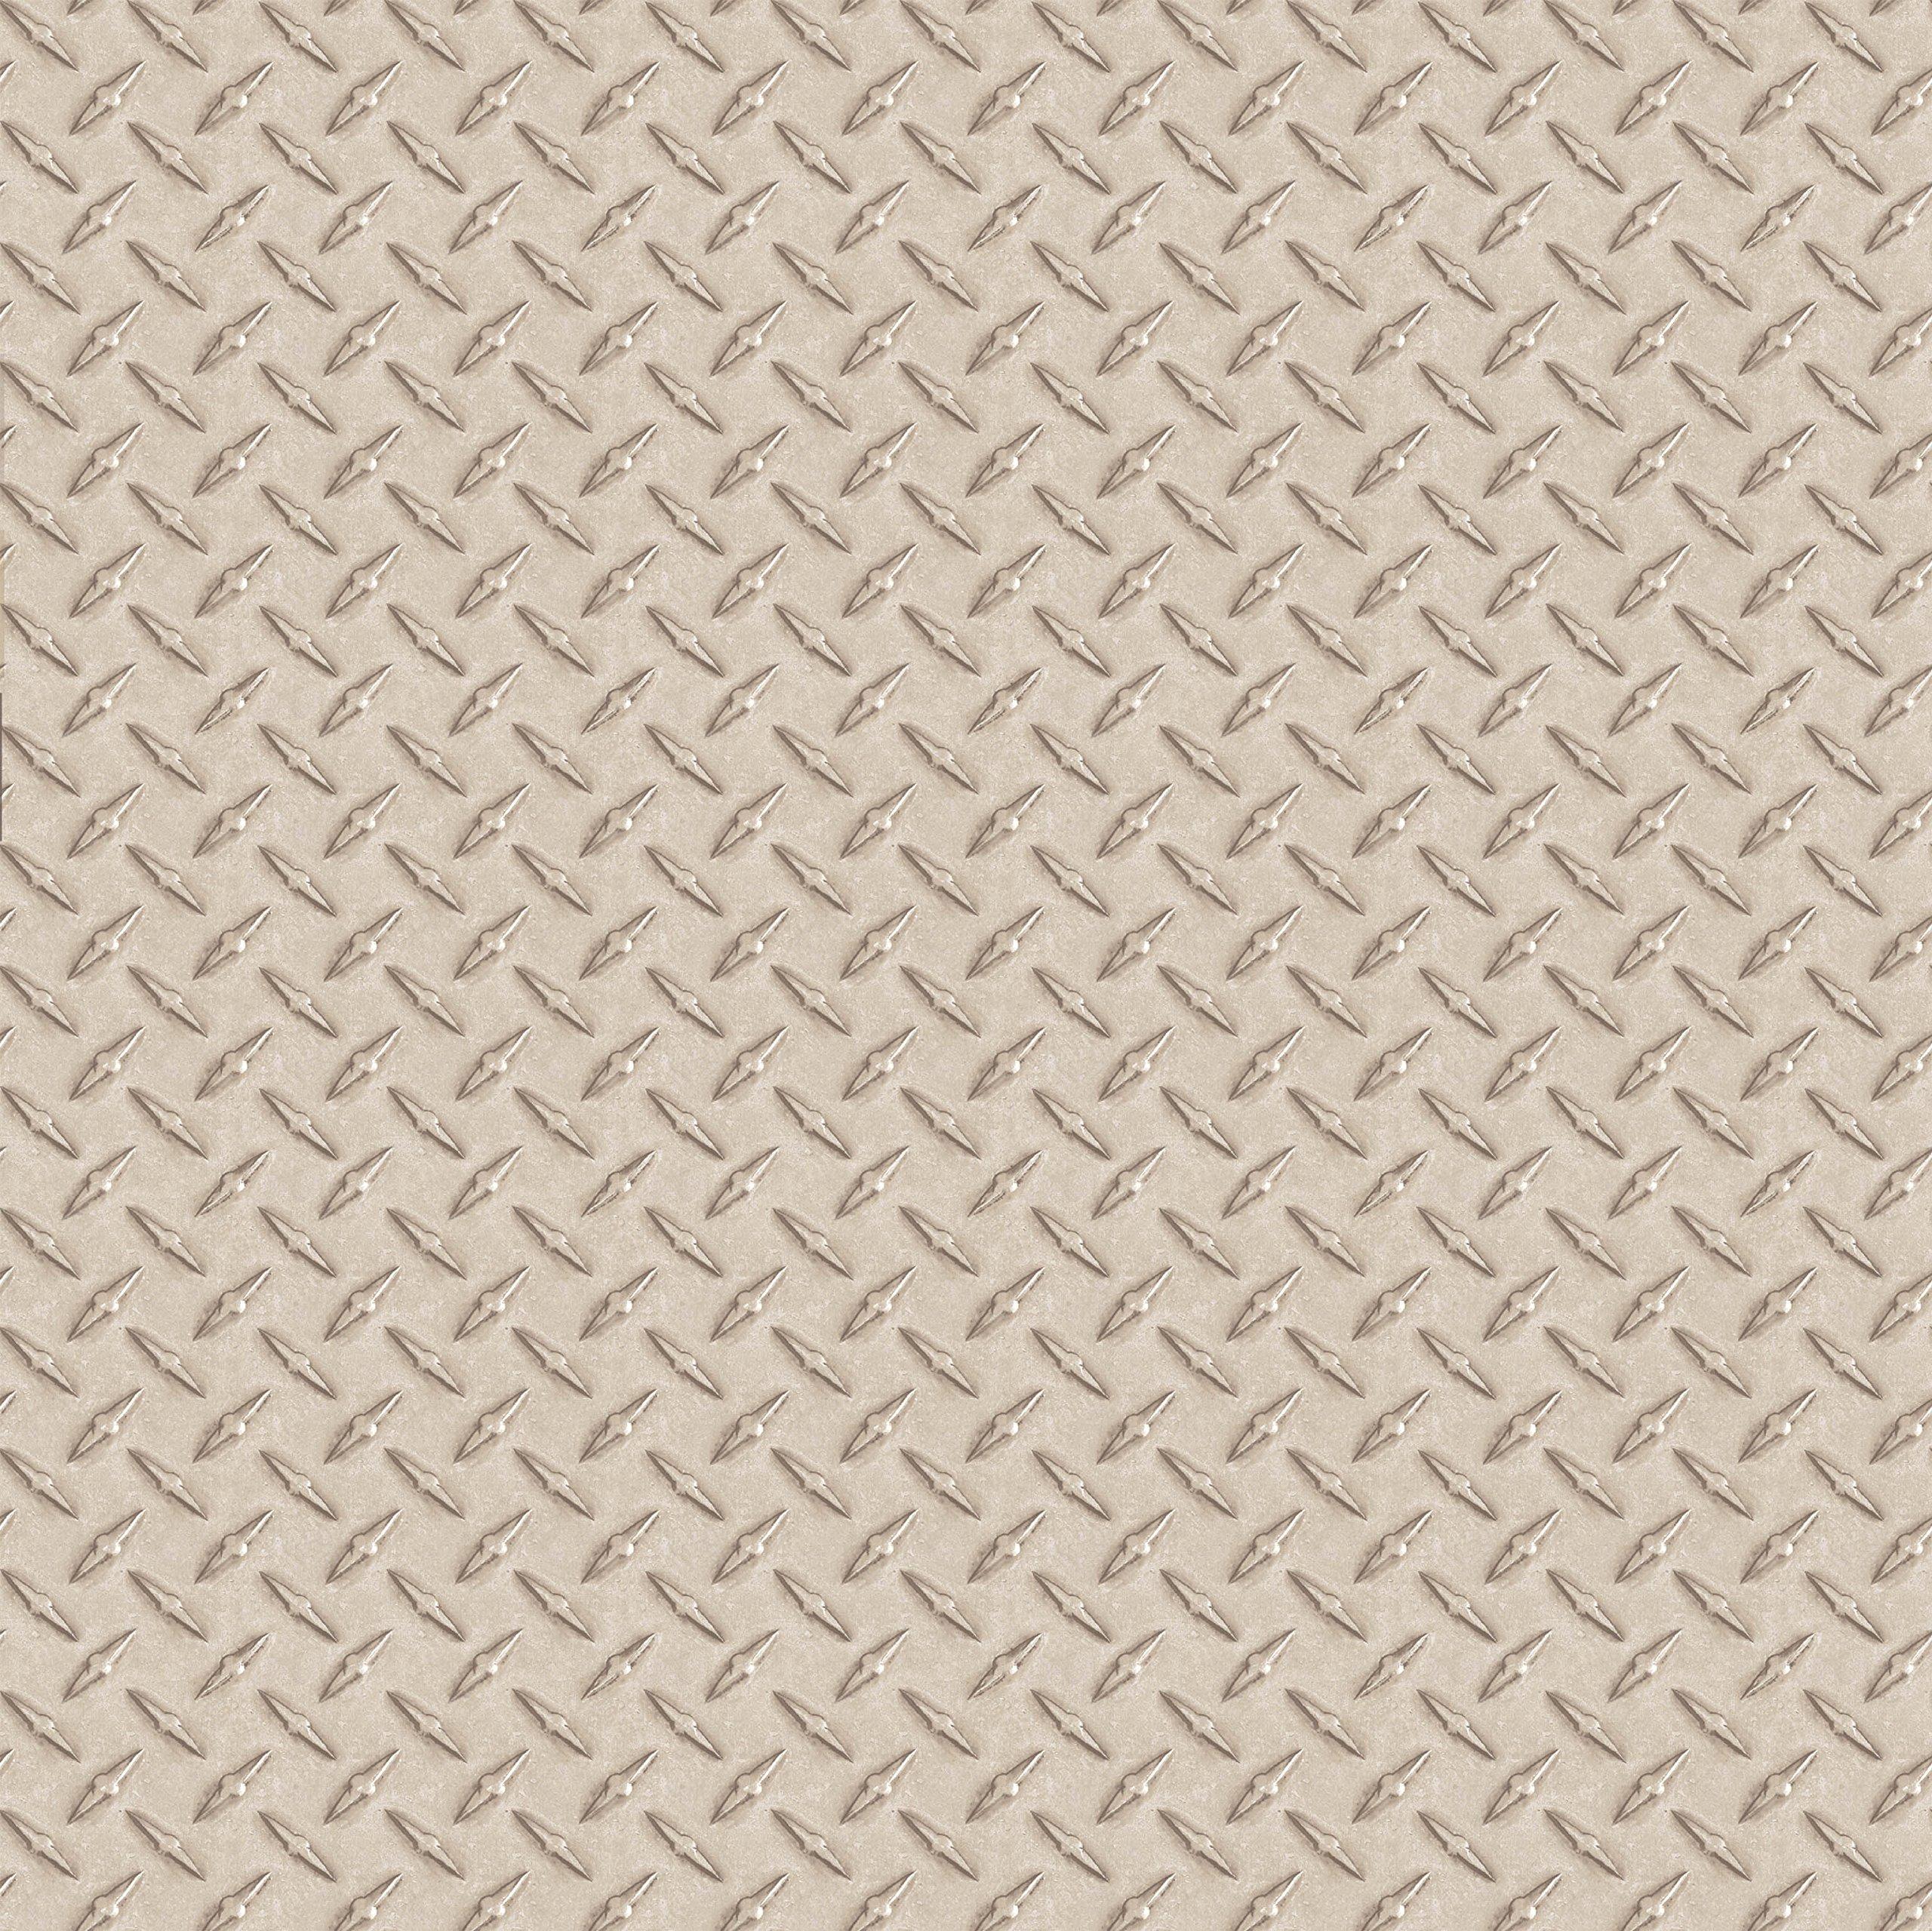 Chesapeake BYR95652 Gridlock Faux Diamond Plate Wallpaper, Grey